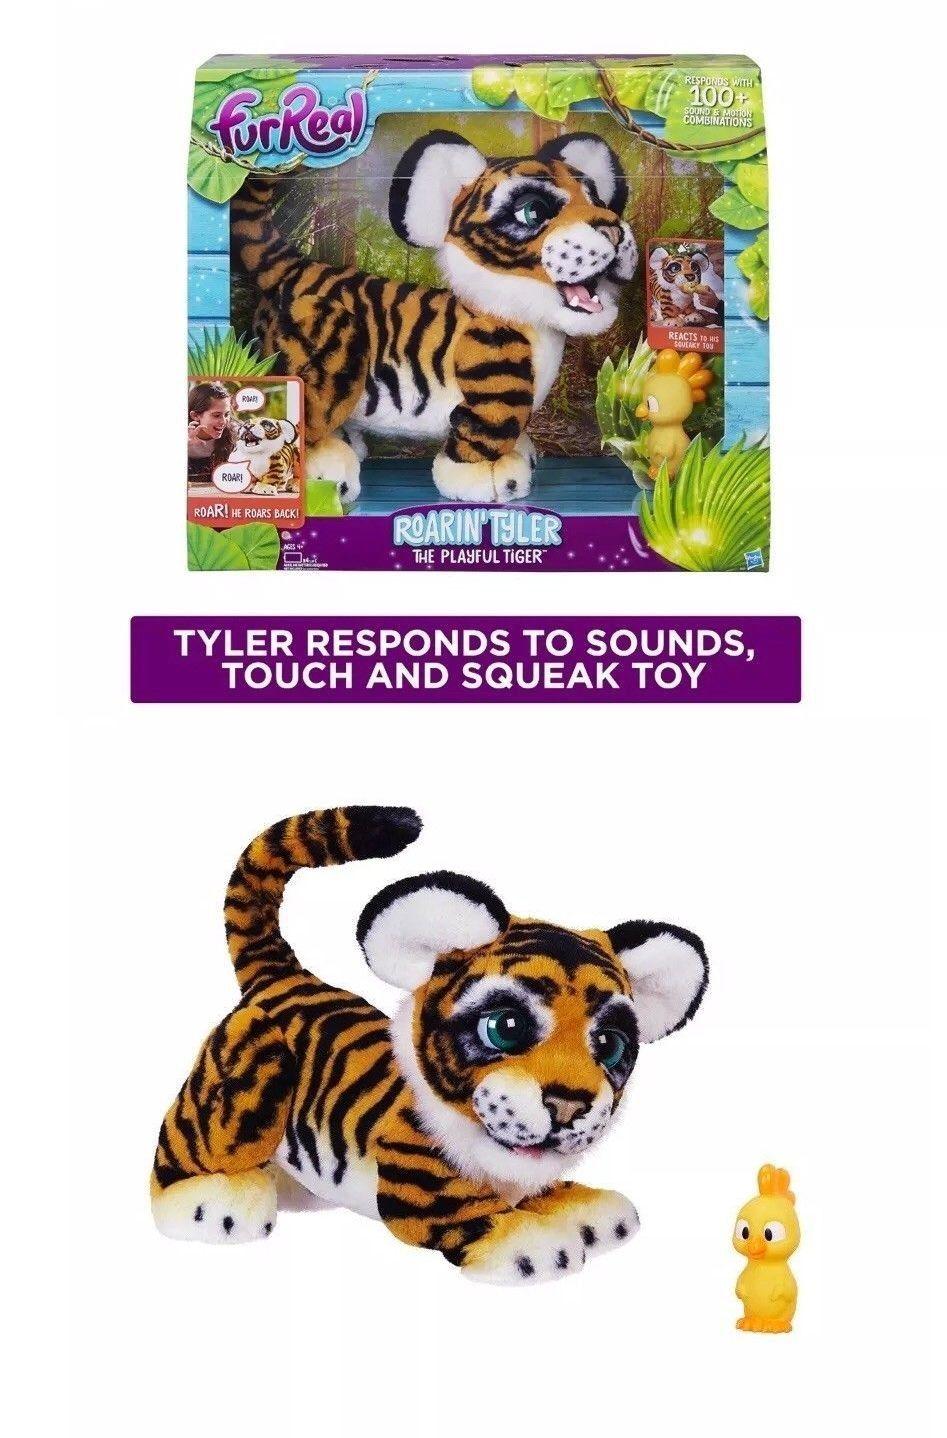 Furreal Friends 38288 Nib Furreal Friends Roarin Tyler The Playful Tiger Pet Interactive Toy Kids Buy It No Fur Real Friends Squeak Toy Interactive Toys